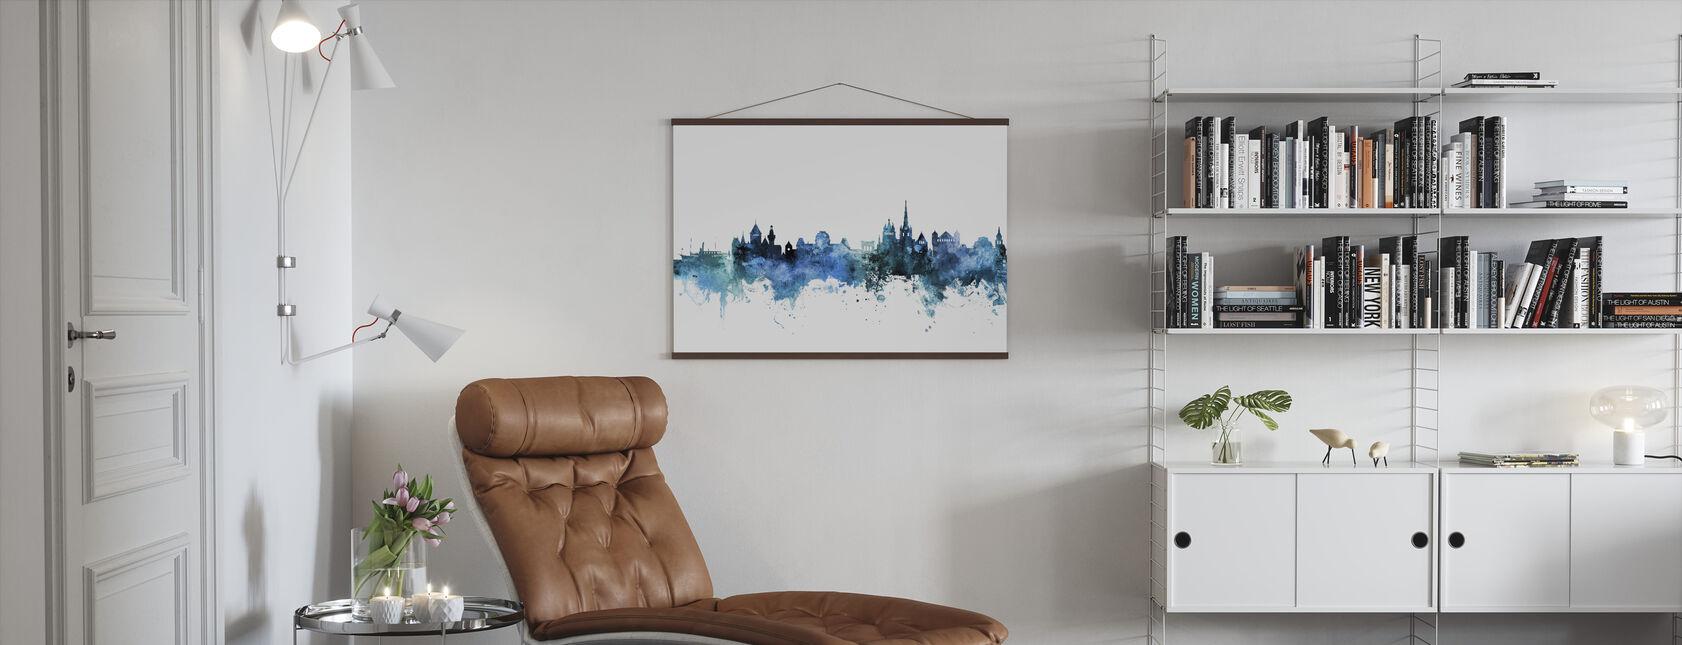 Lausanne Switzerland Skyline - Poster - Living Room